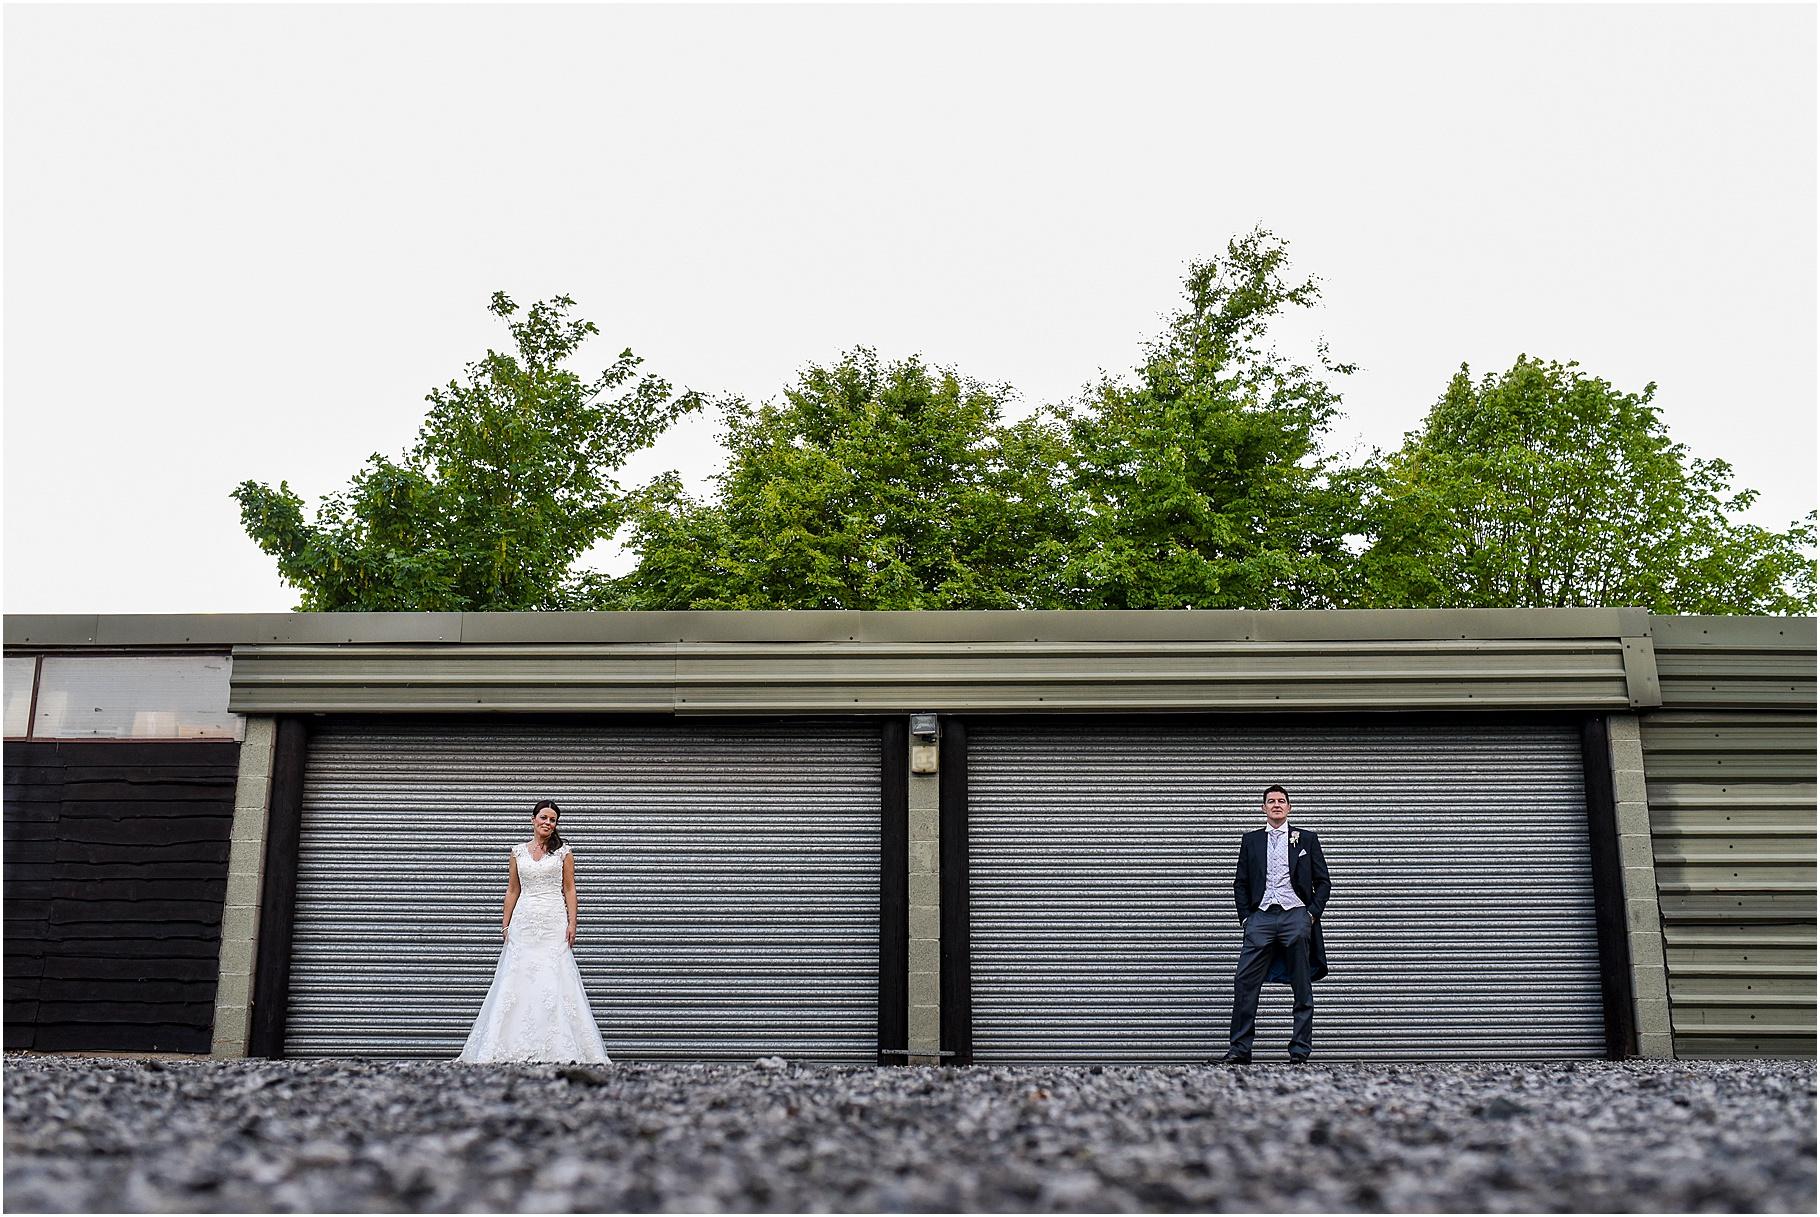 dan-wootton-photography-2017-weddings-031.jpg